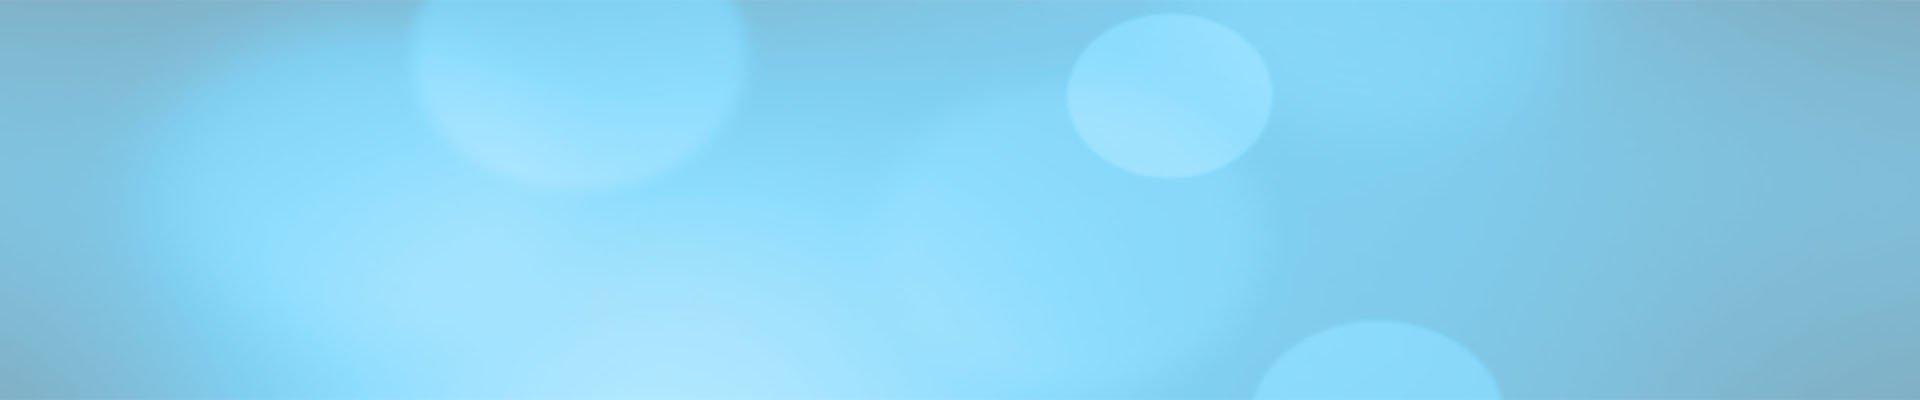 blue-sanibel